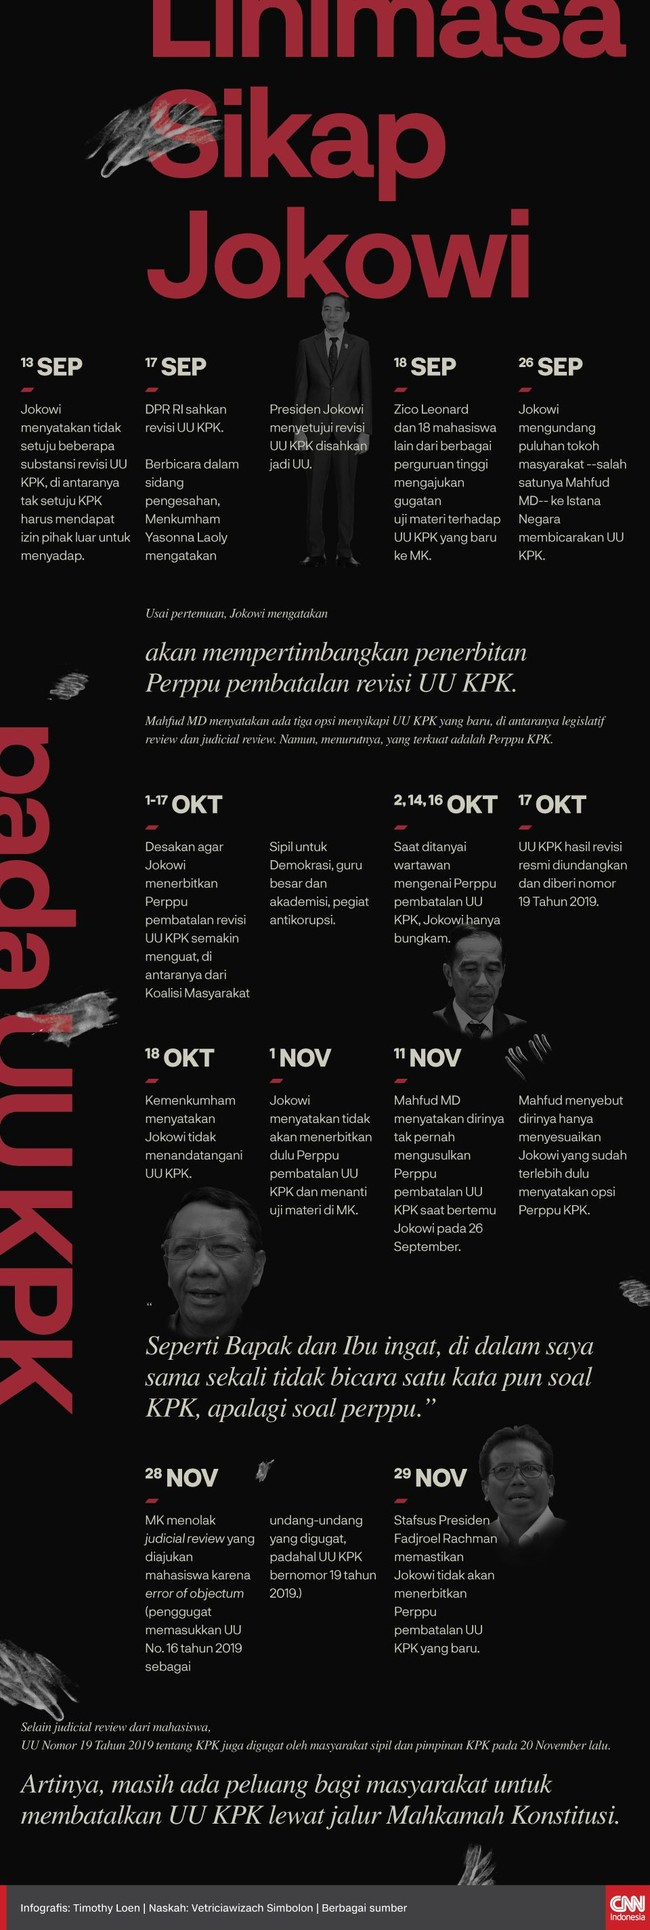 Istana telah memastikan Presiden Jokowi tidak akan menerbitkan Perppu untuk membatalkan UU KPK hasil revisi.